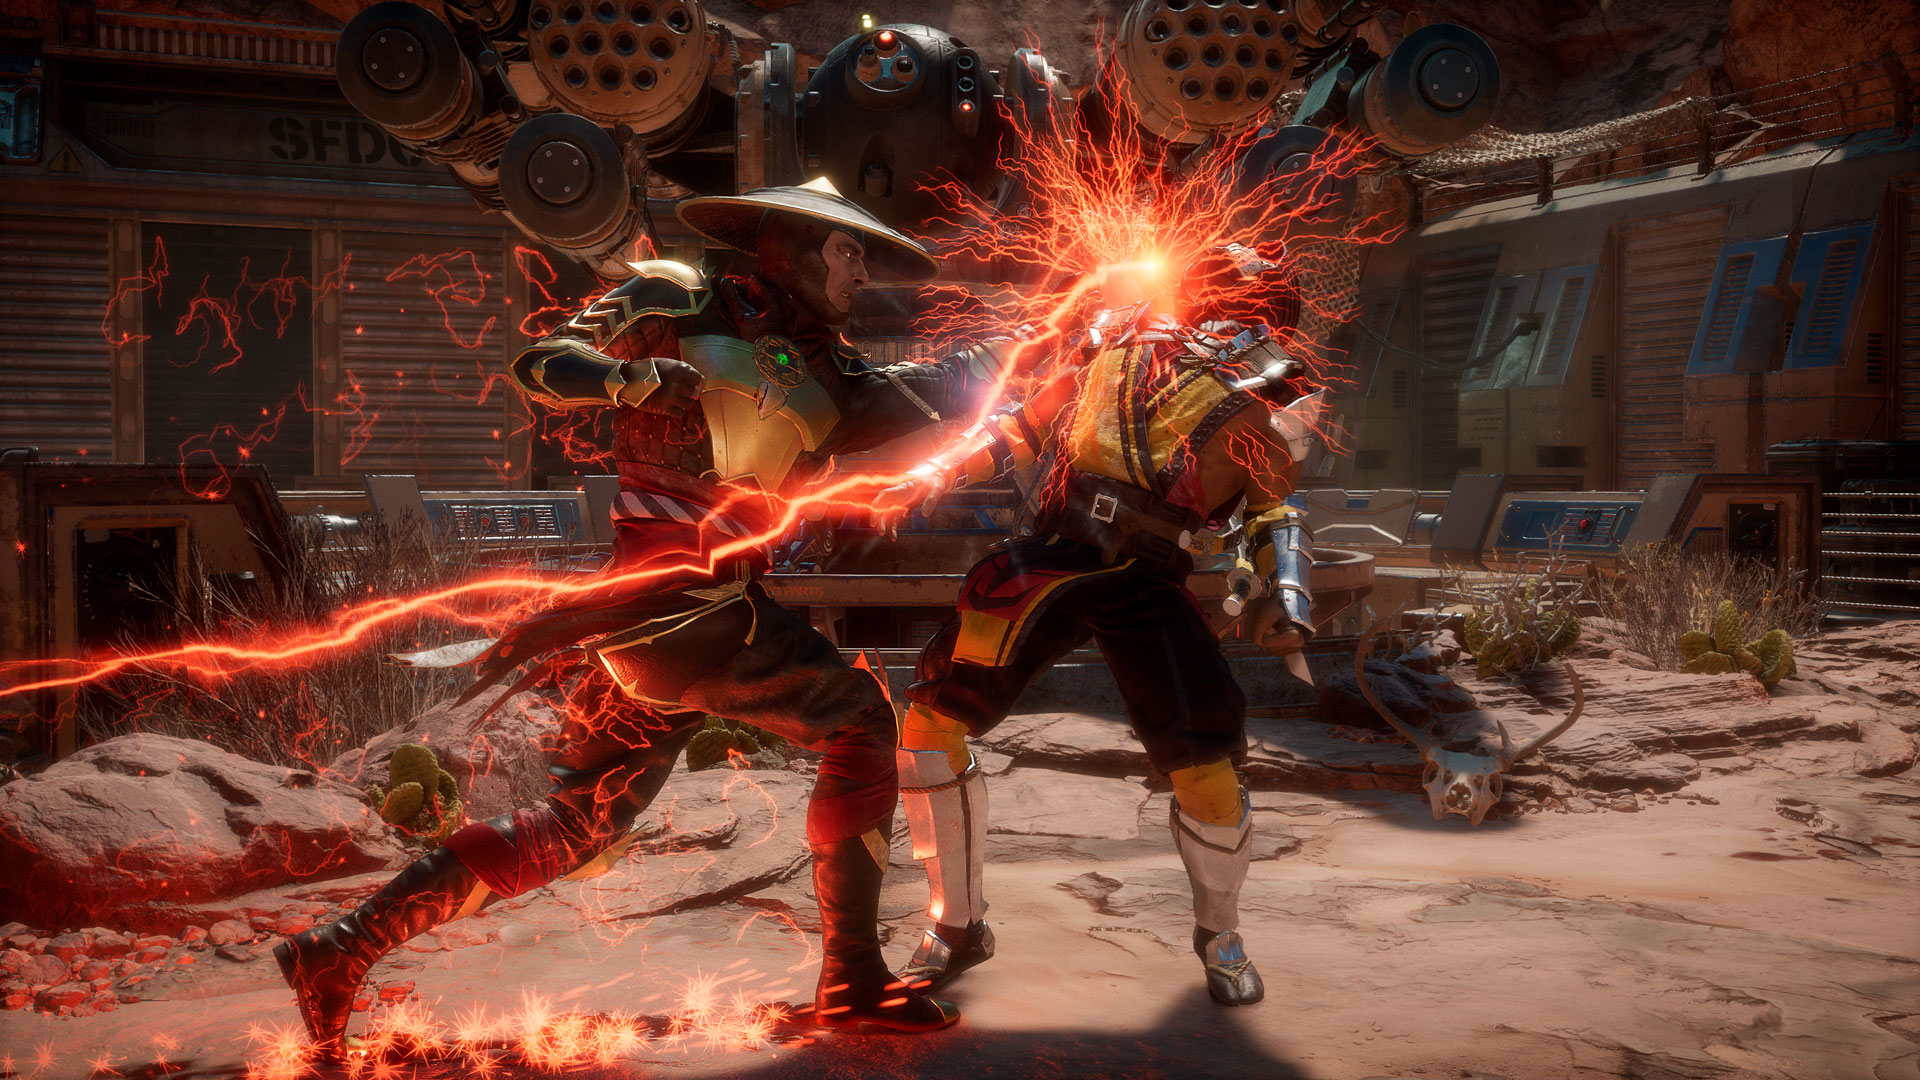 Купить Mortal Kombat 11 на PS4